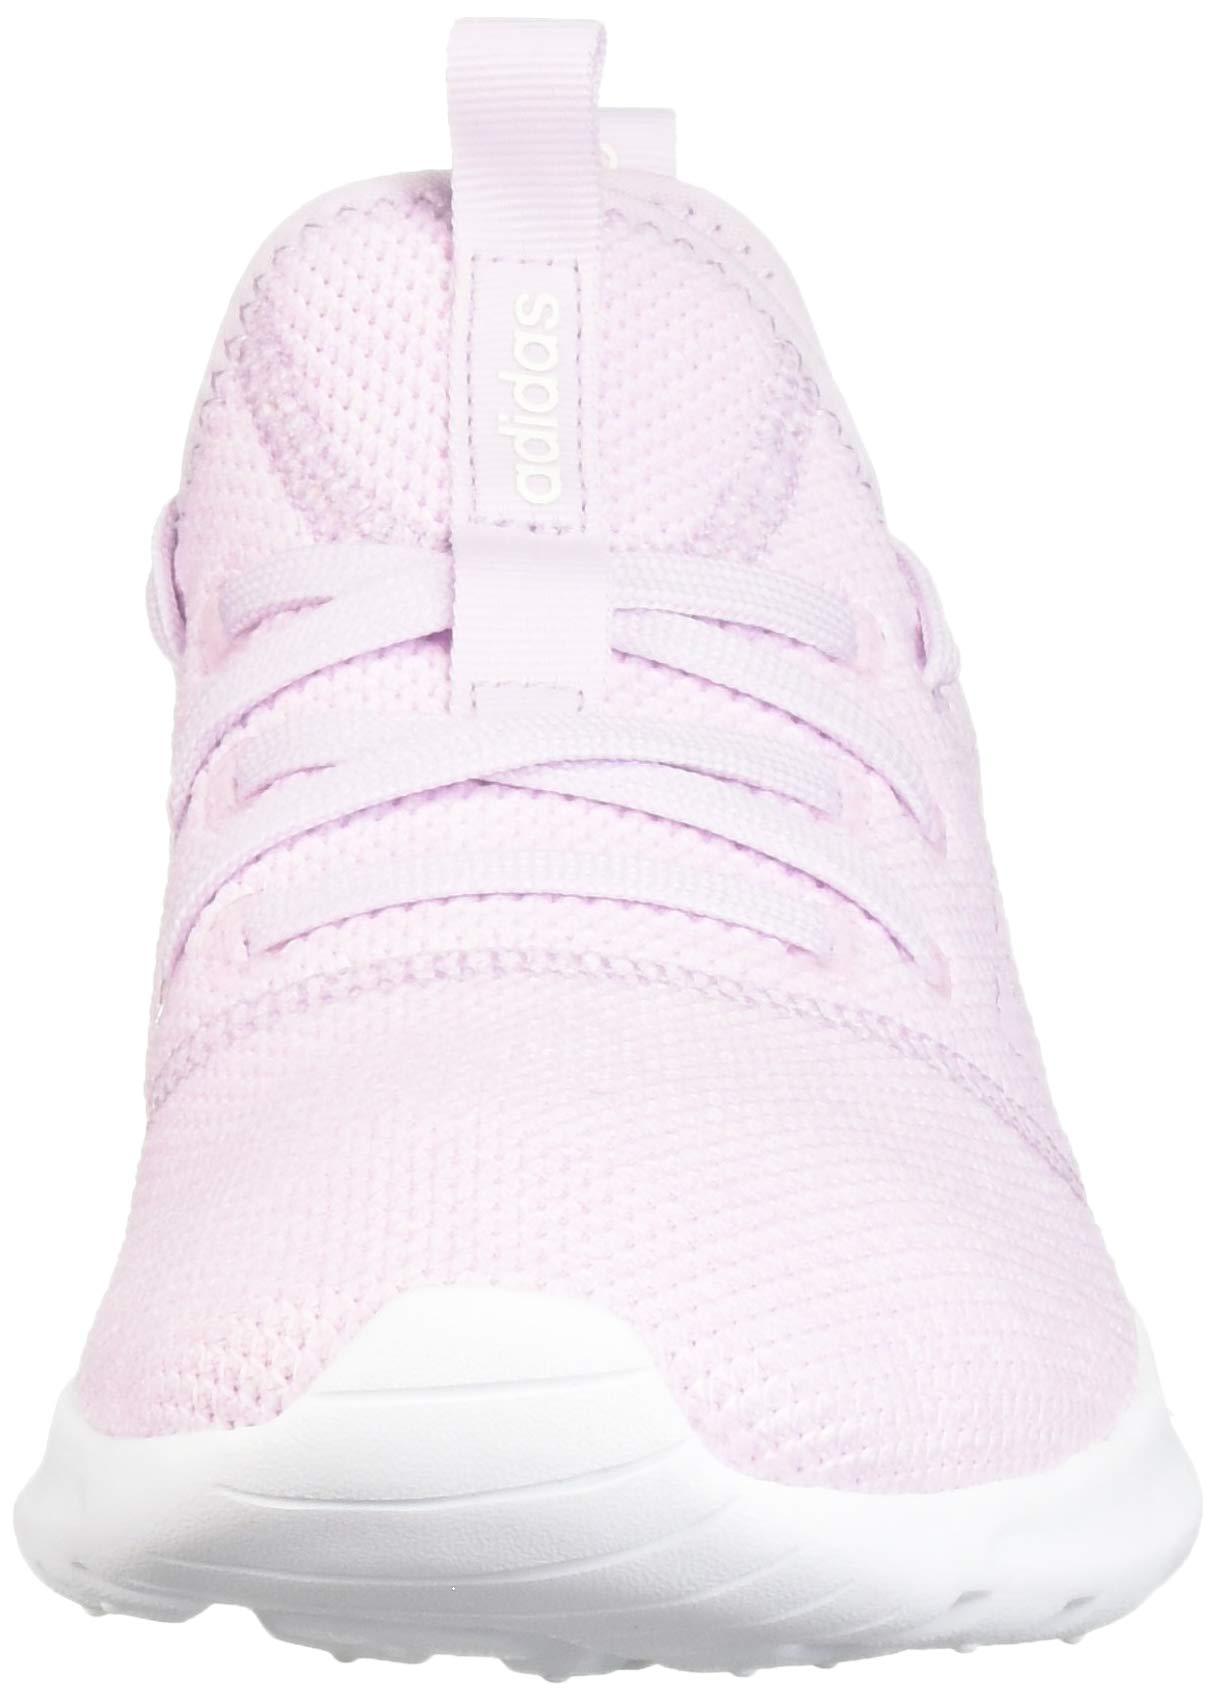 adidas Women's Cloudfoam Pure, aero Pink/White, 5.5 M US by adidas (Image #4)